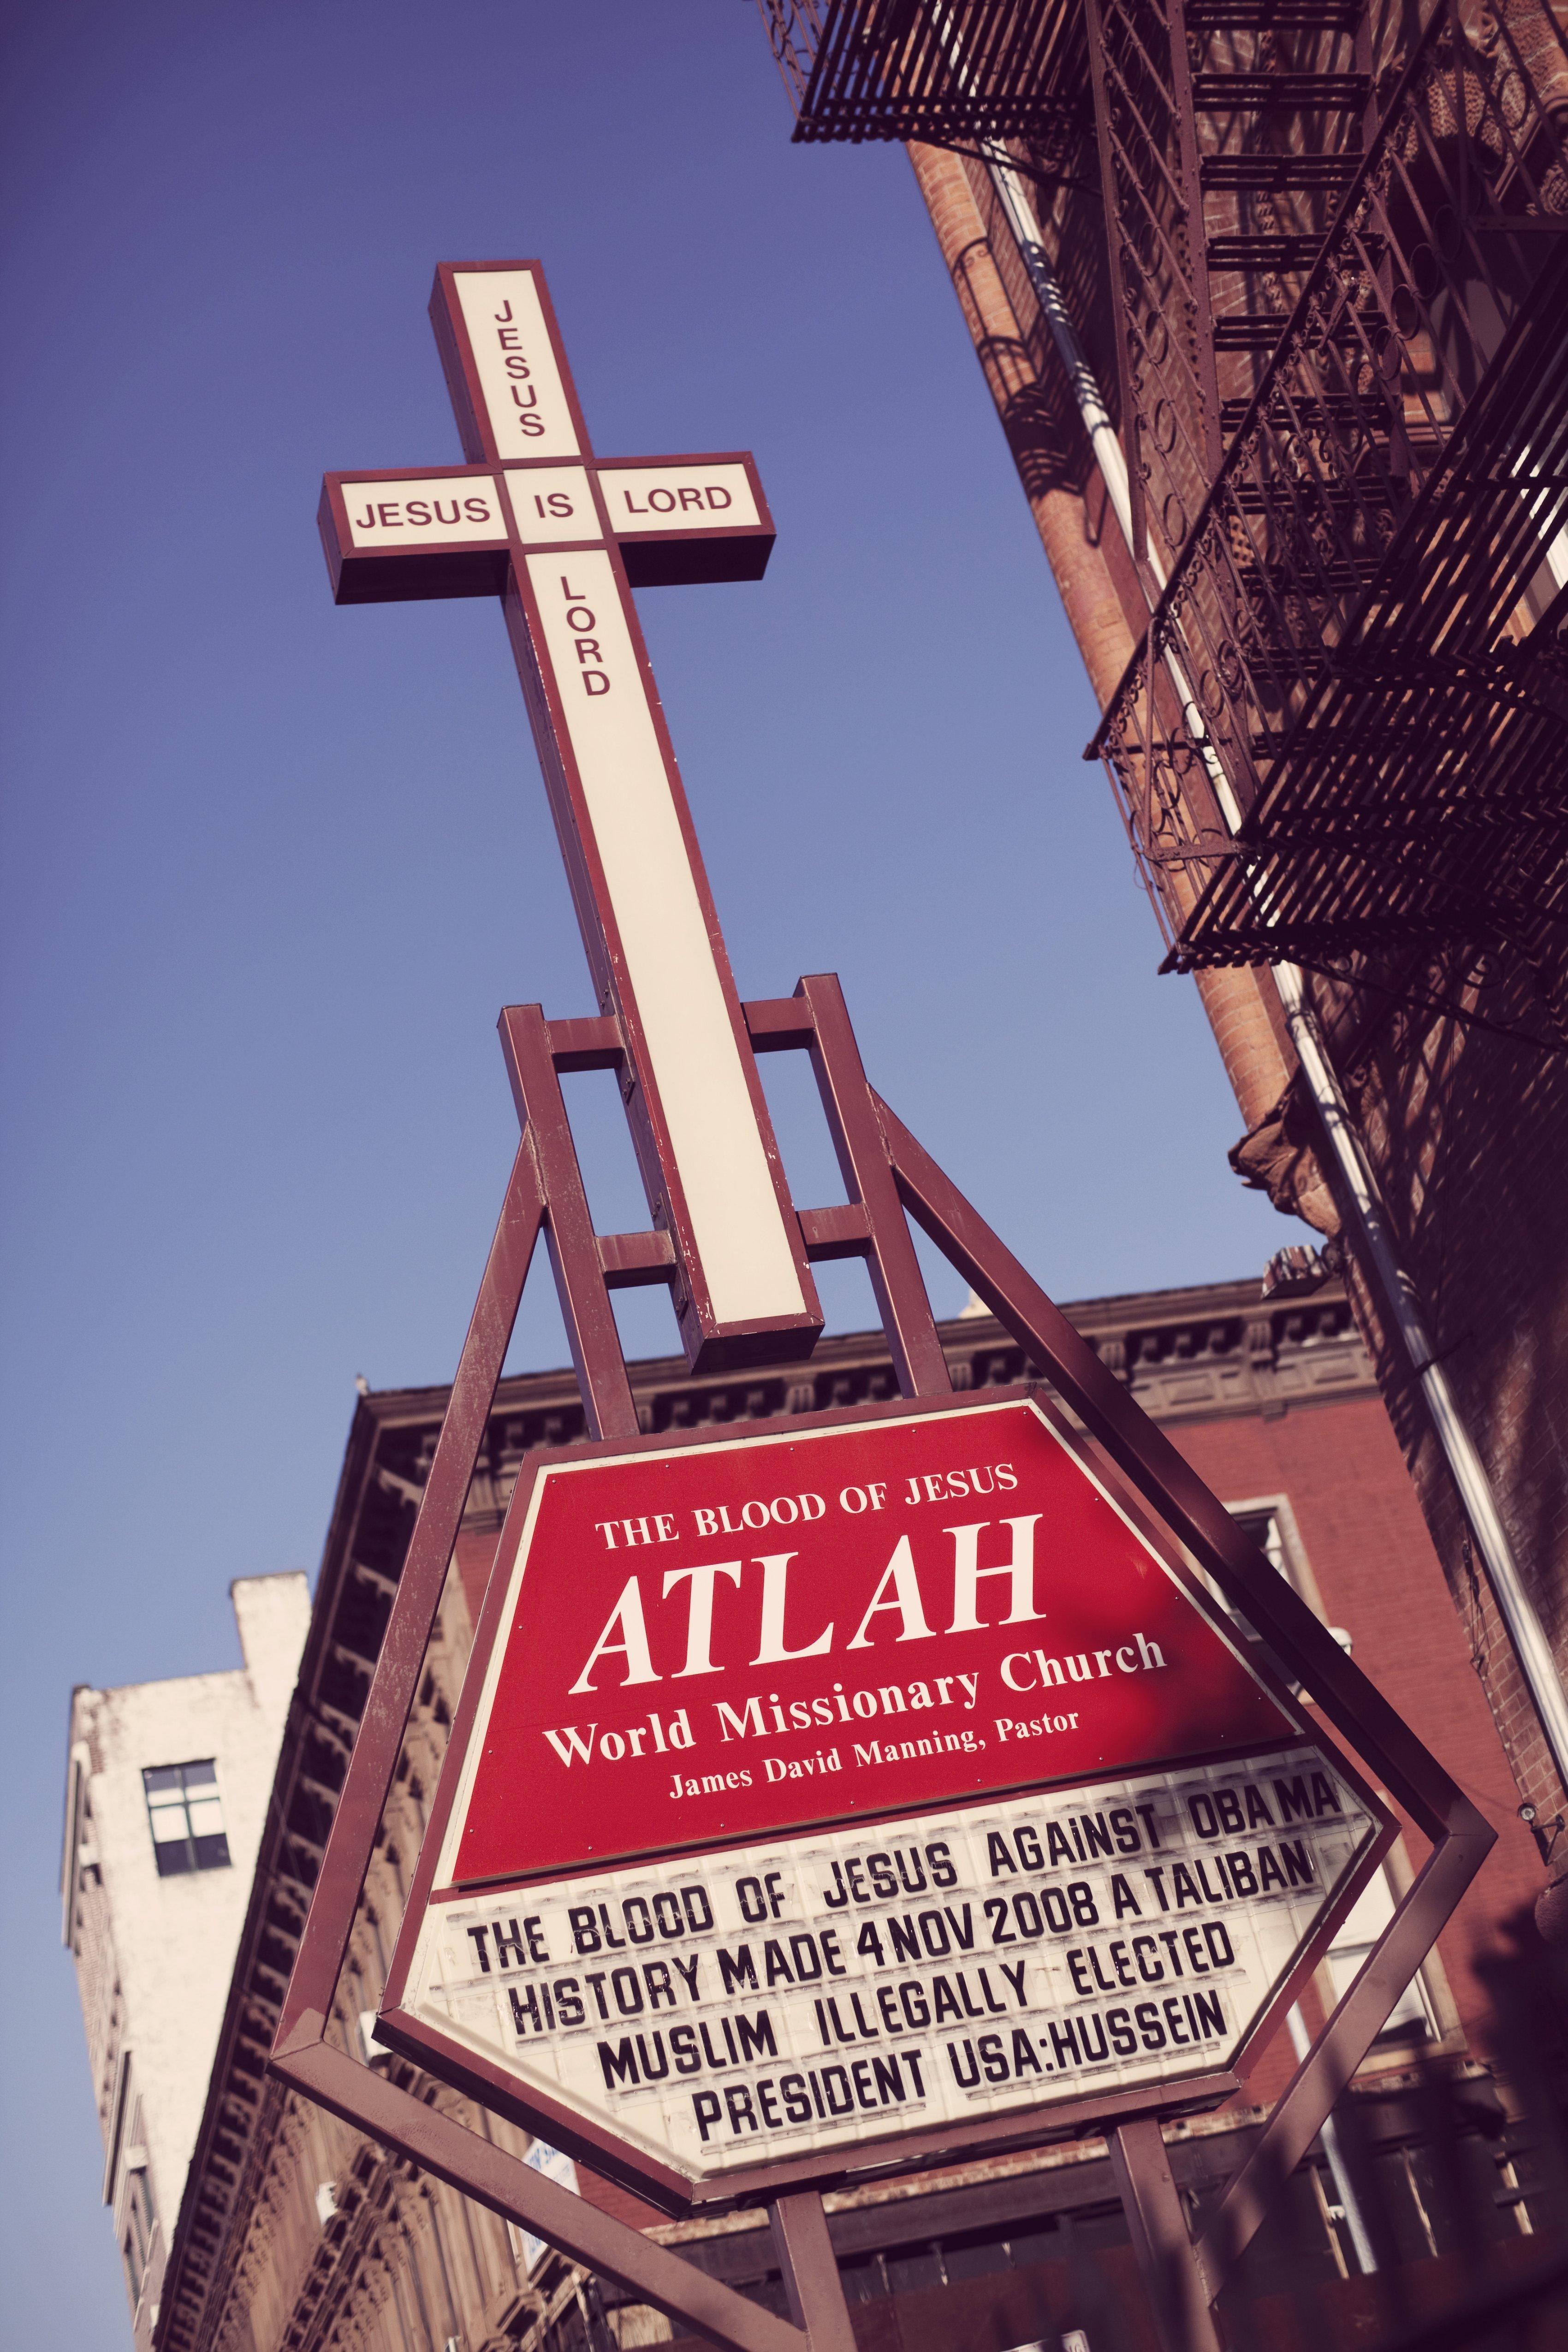 The ATLAH World Missionary Church in New York's Harlem neighborhood.